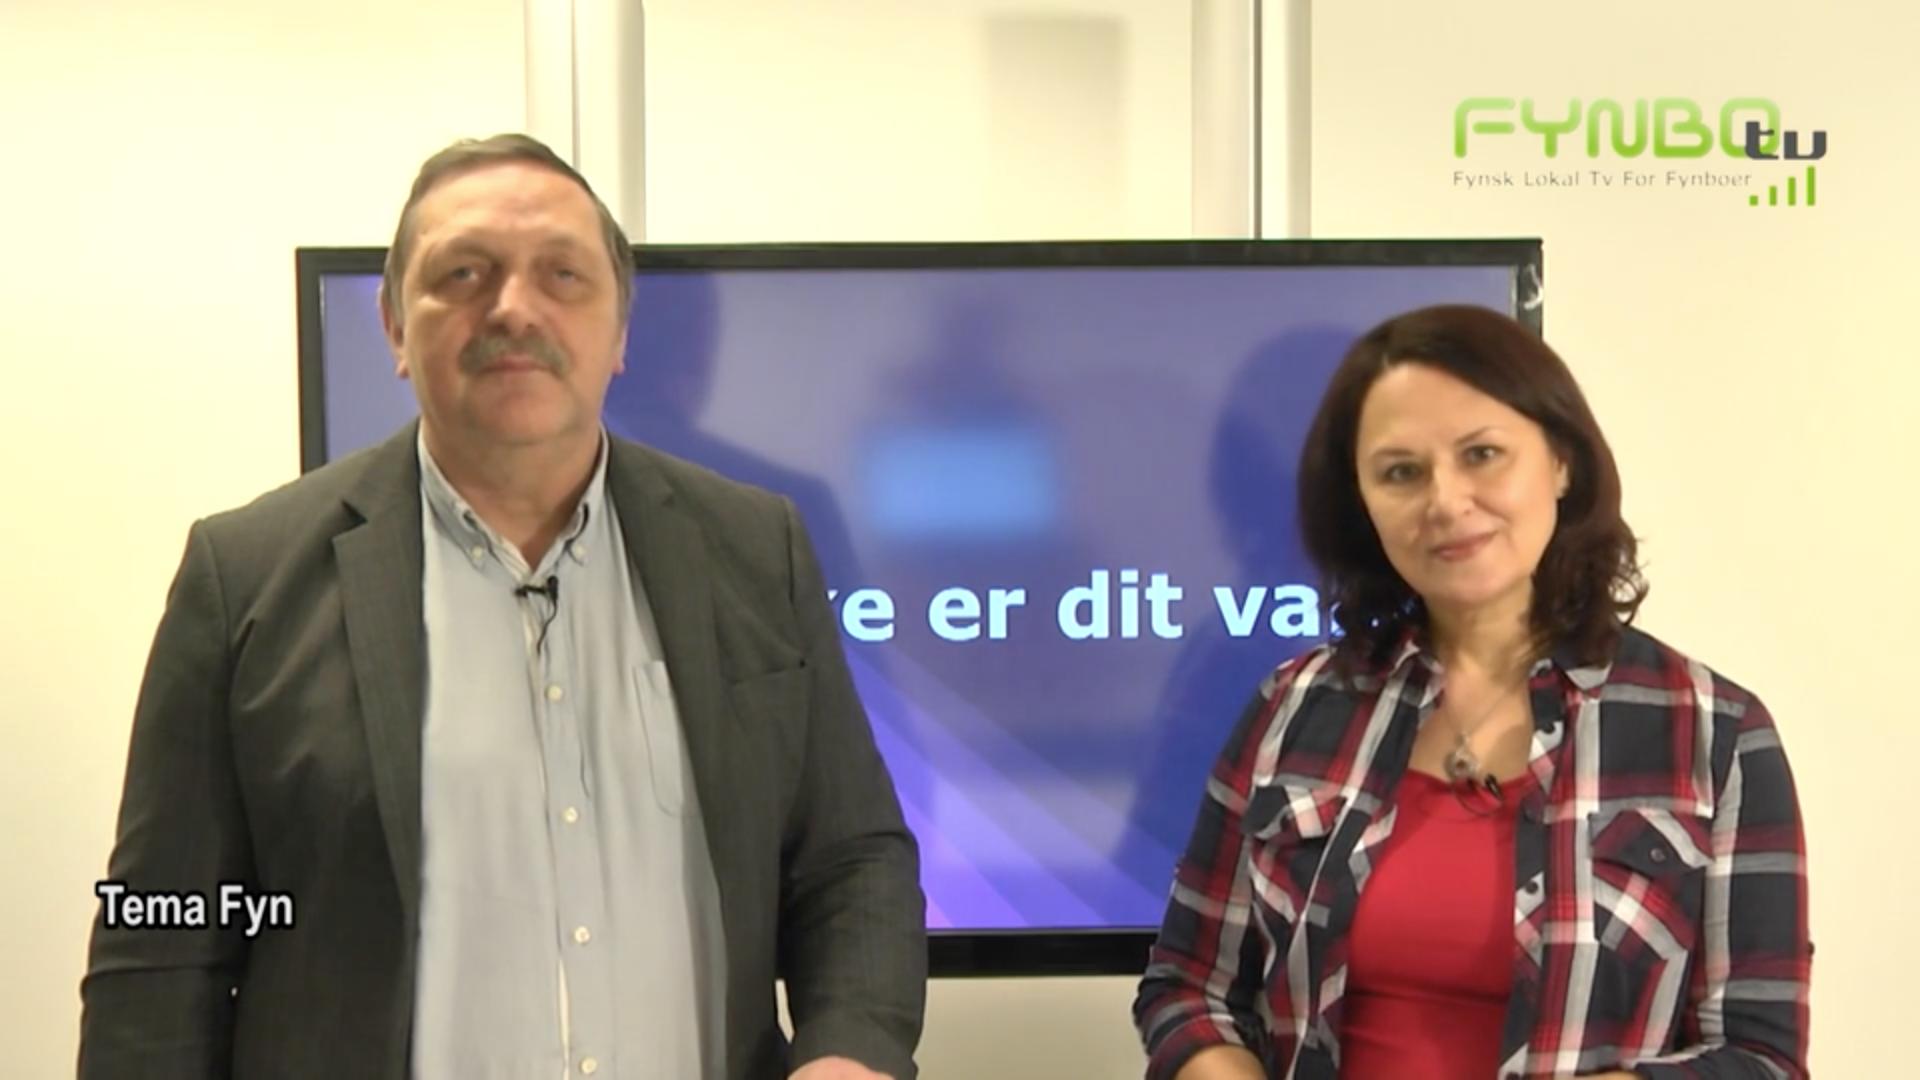 Lykkeekspert Nathalie Dahl på TV Anturi Life Coaching